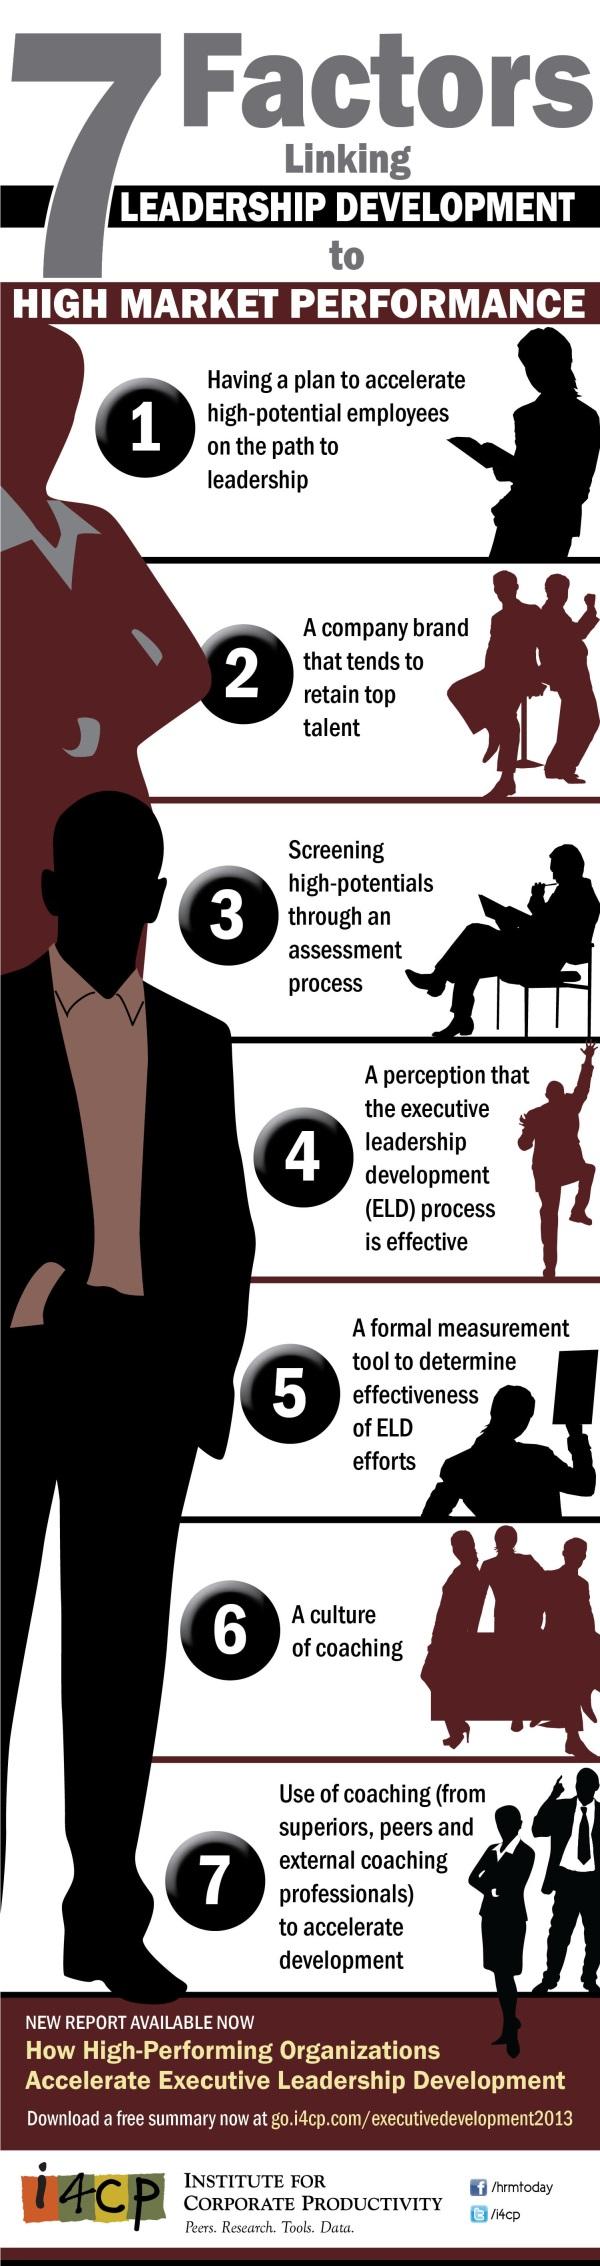 Infographic 7 Factors Linking Leadership Development To High Market